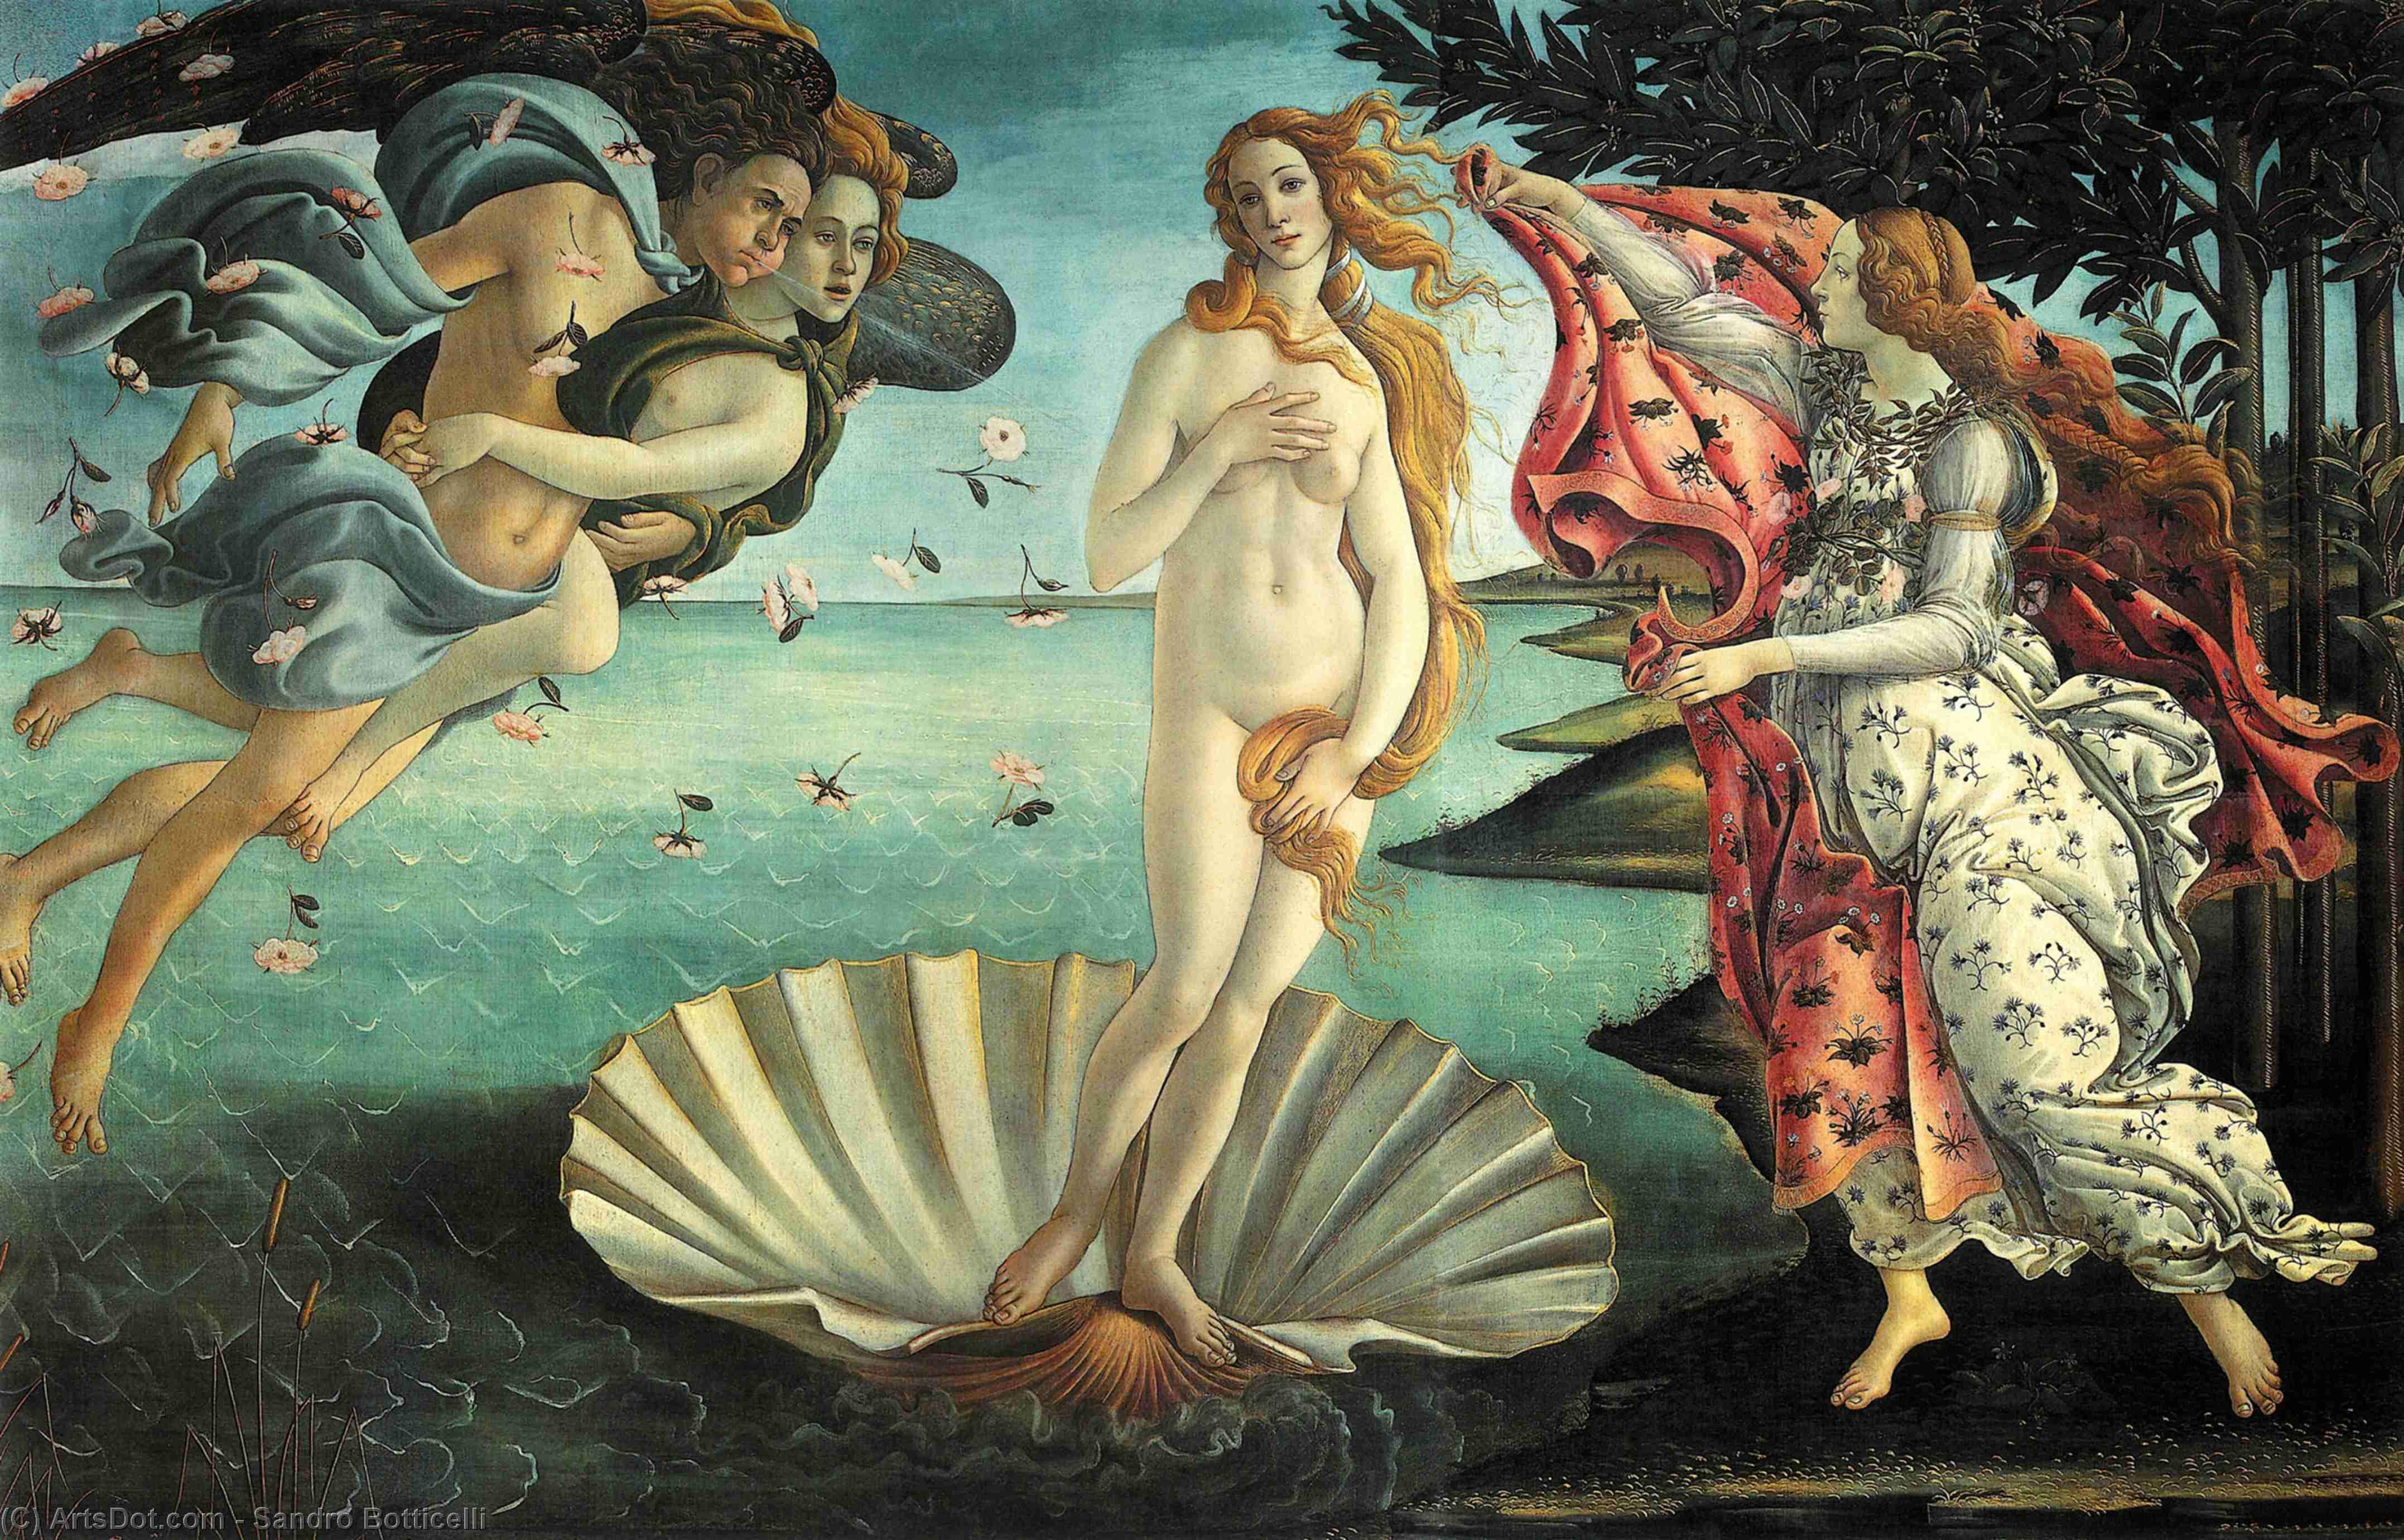 维纳斯的诞生 - Sandro Botticelli